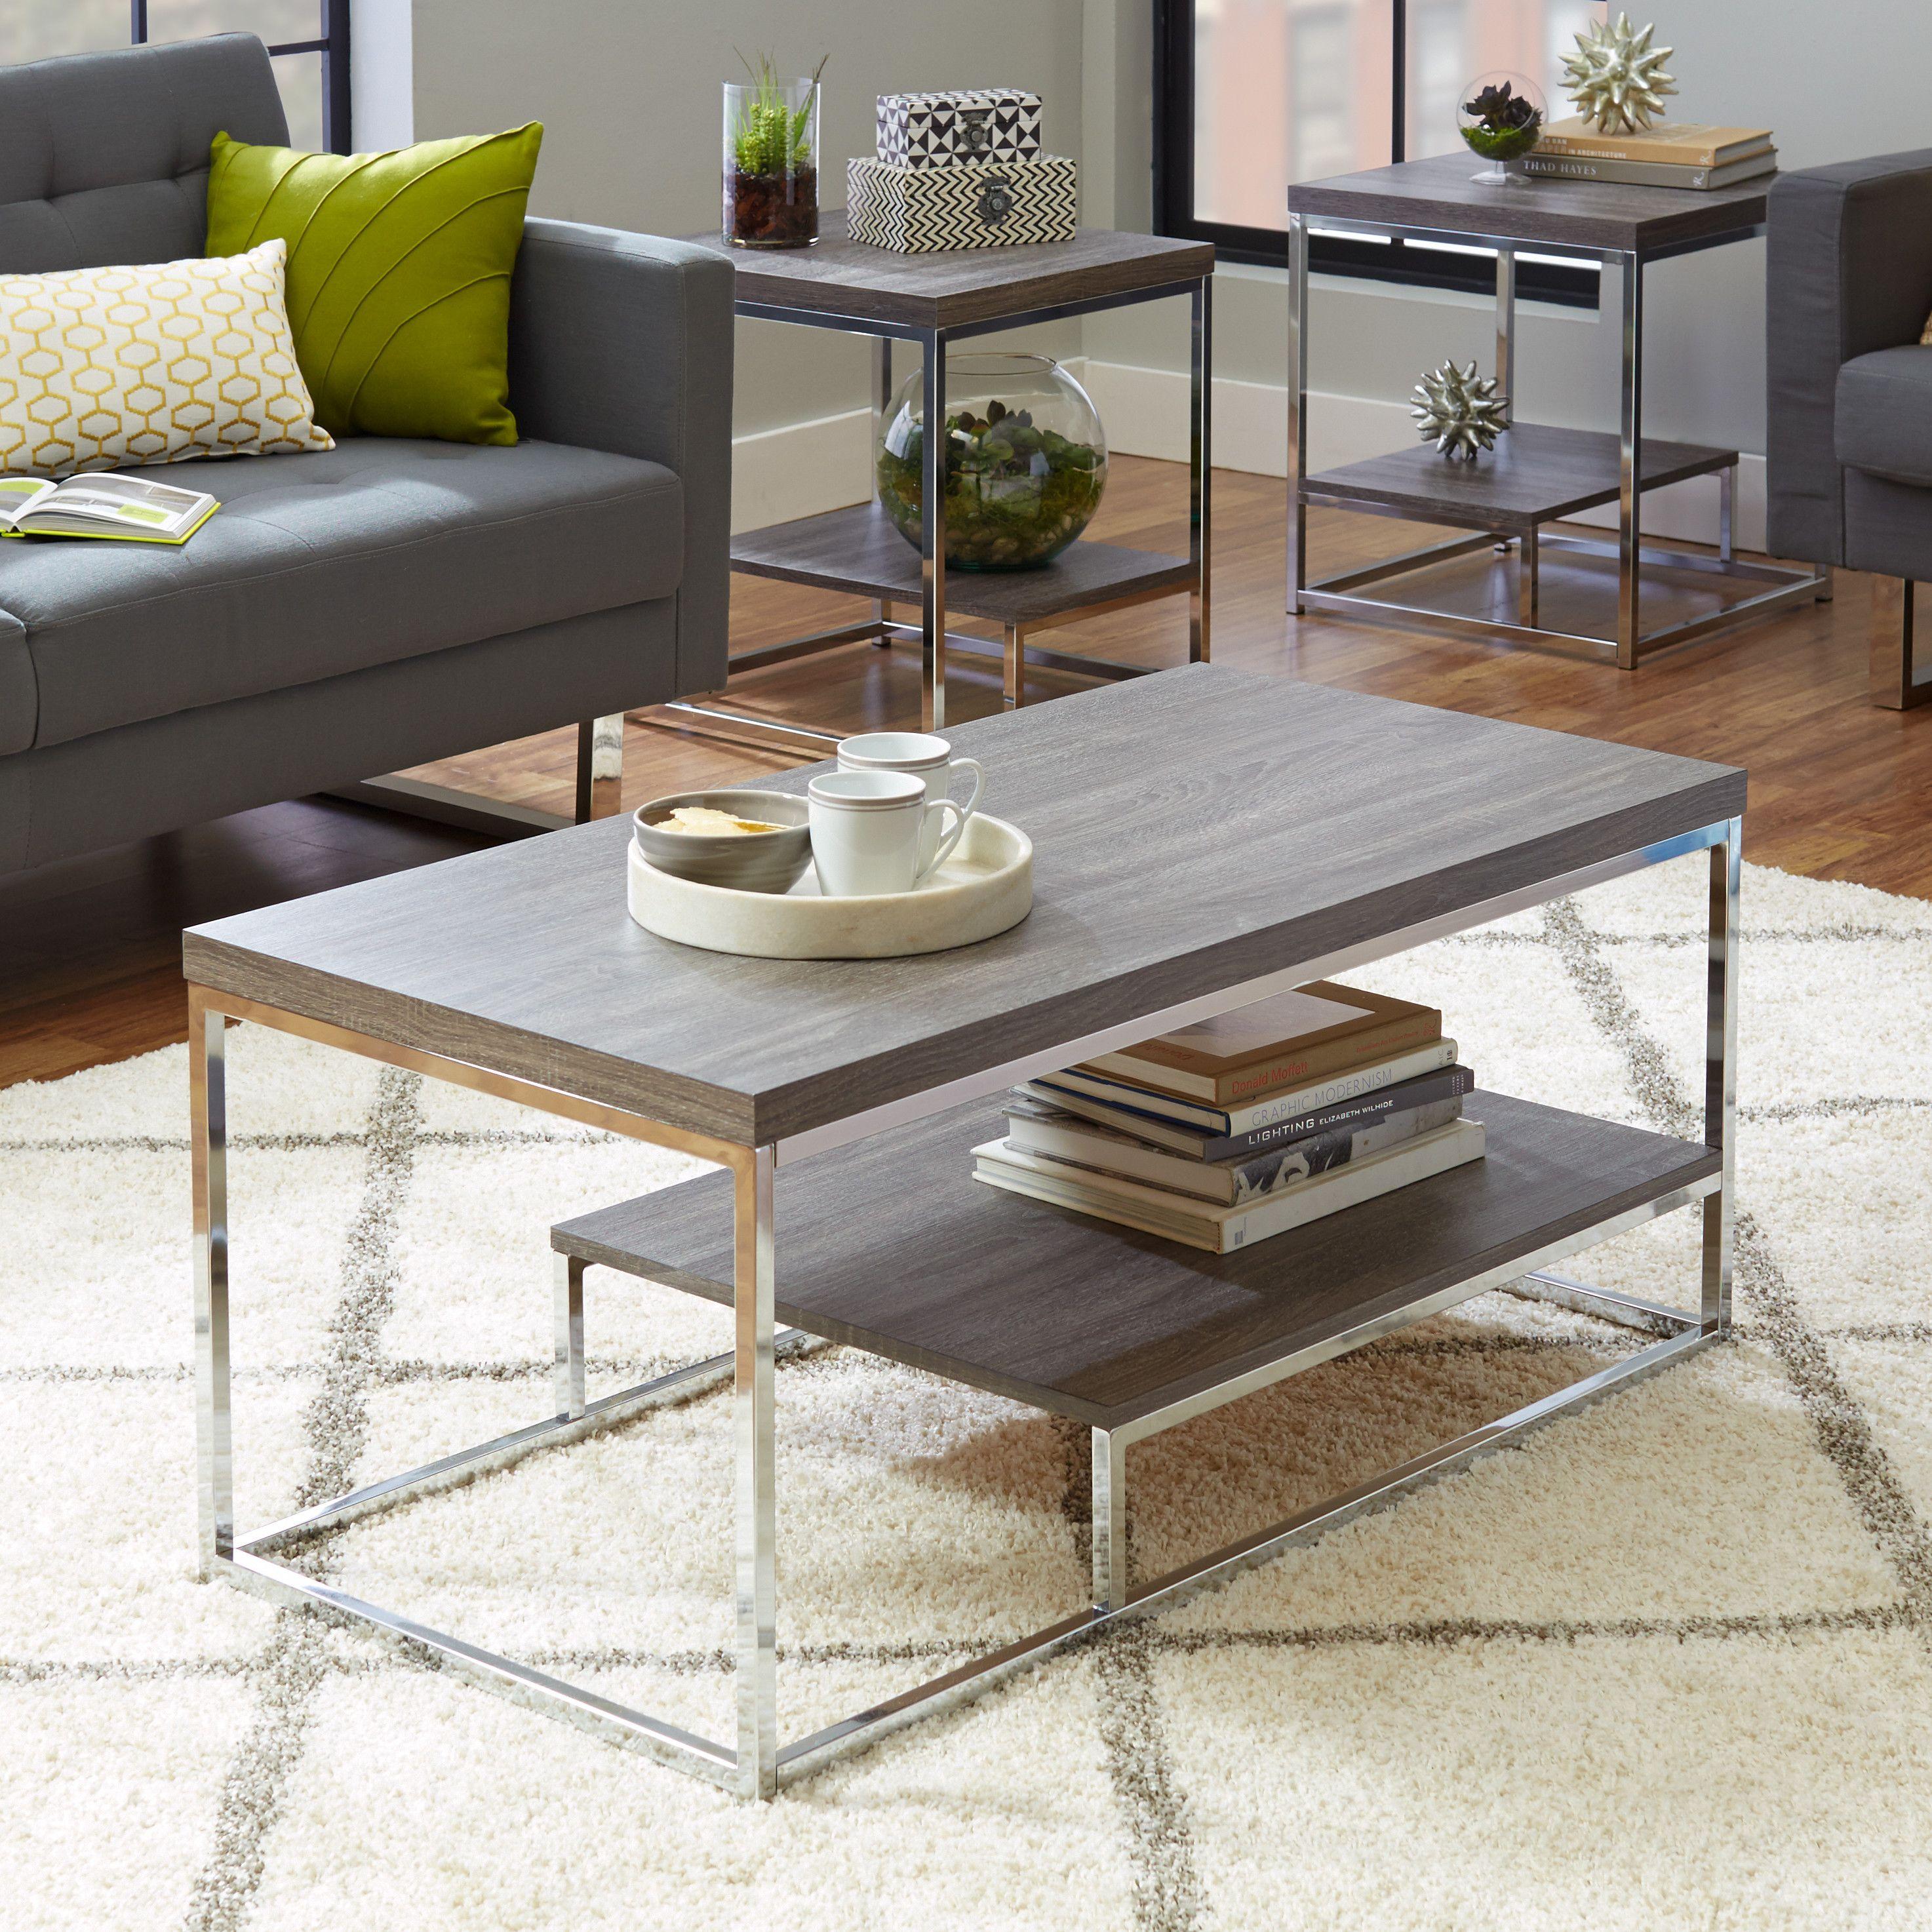 Philippos 3 Piece Coffee Table Set Living Room Table Sets 3 Piece Coffee Table Set Modern Living Room Table #three #piece #living #room #table #set